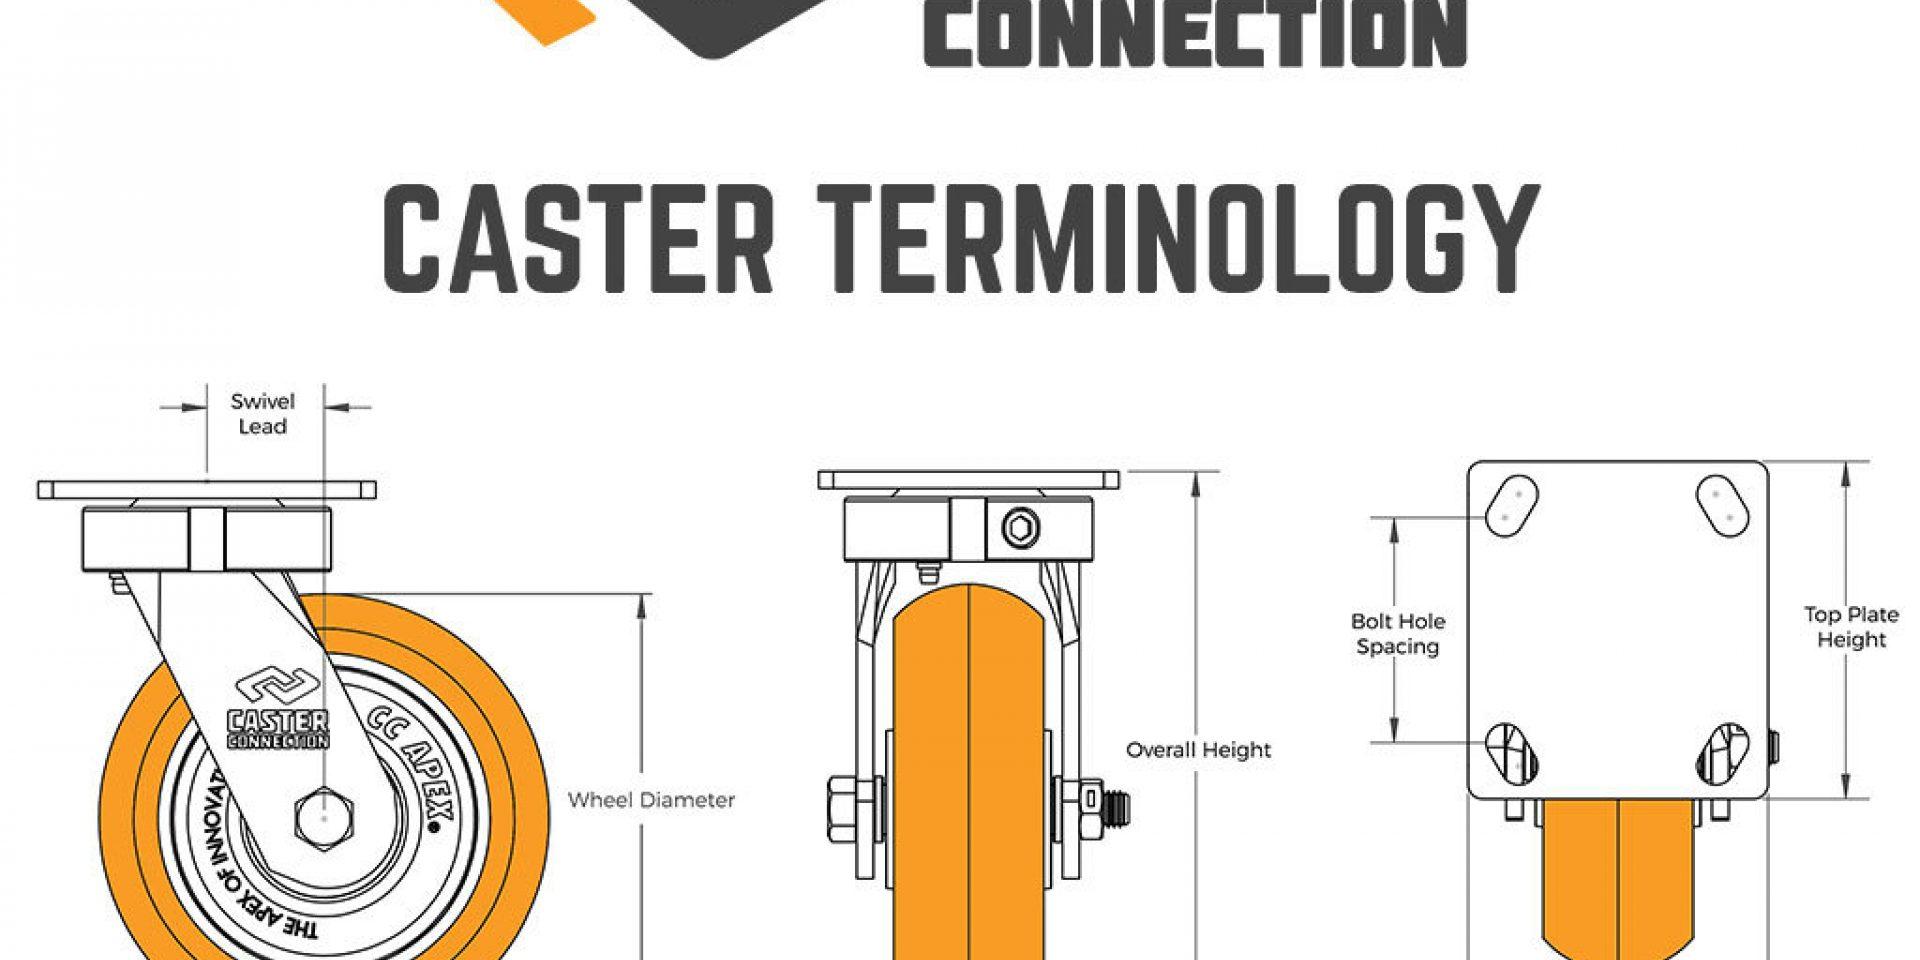 Caster Terminology 1024x697 1